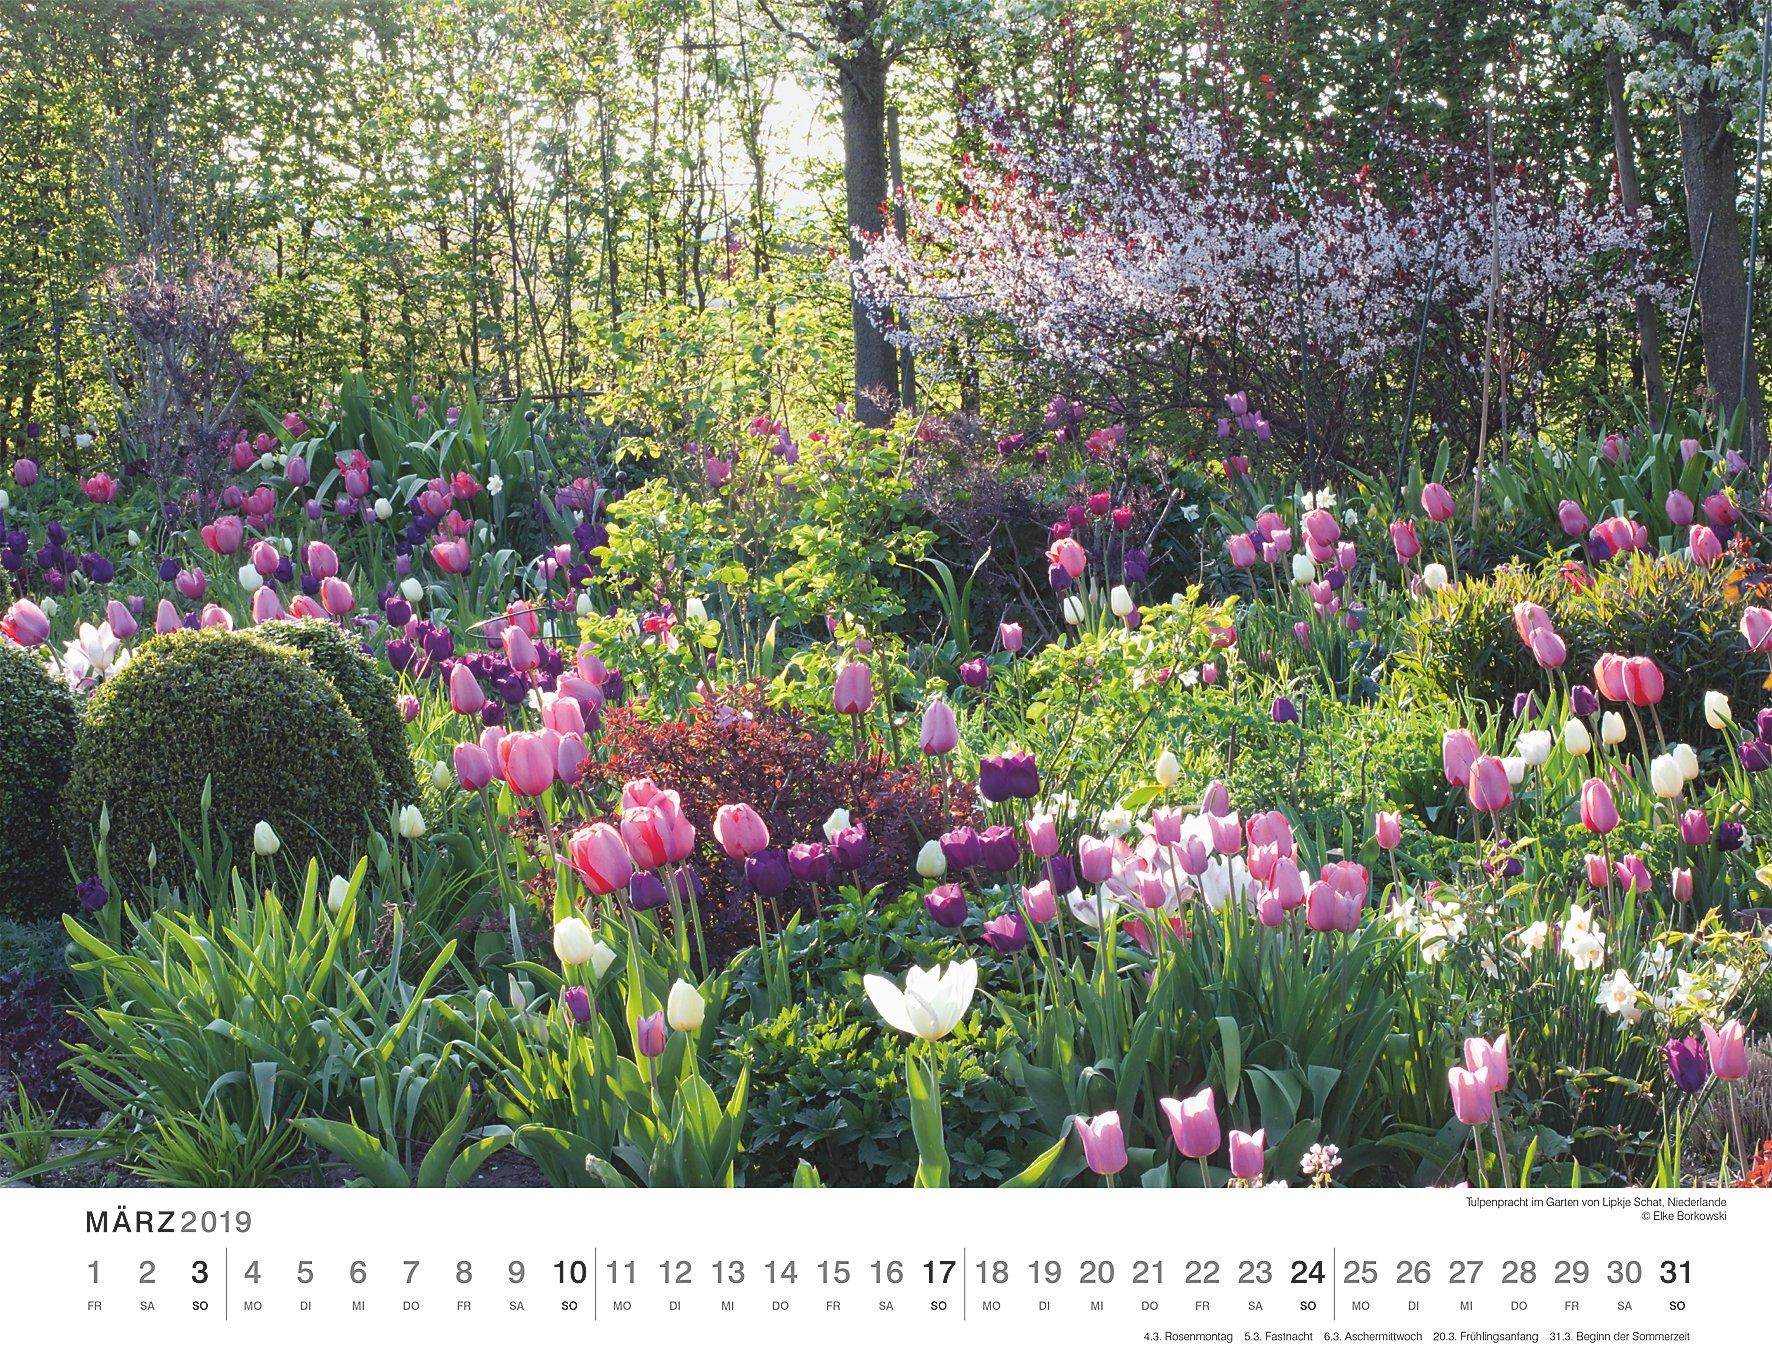 Schöne Gärten 2019 Kalender Günstig Bei Weltbildde Bestellen